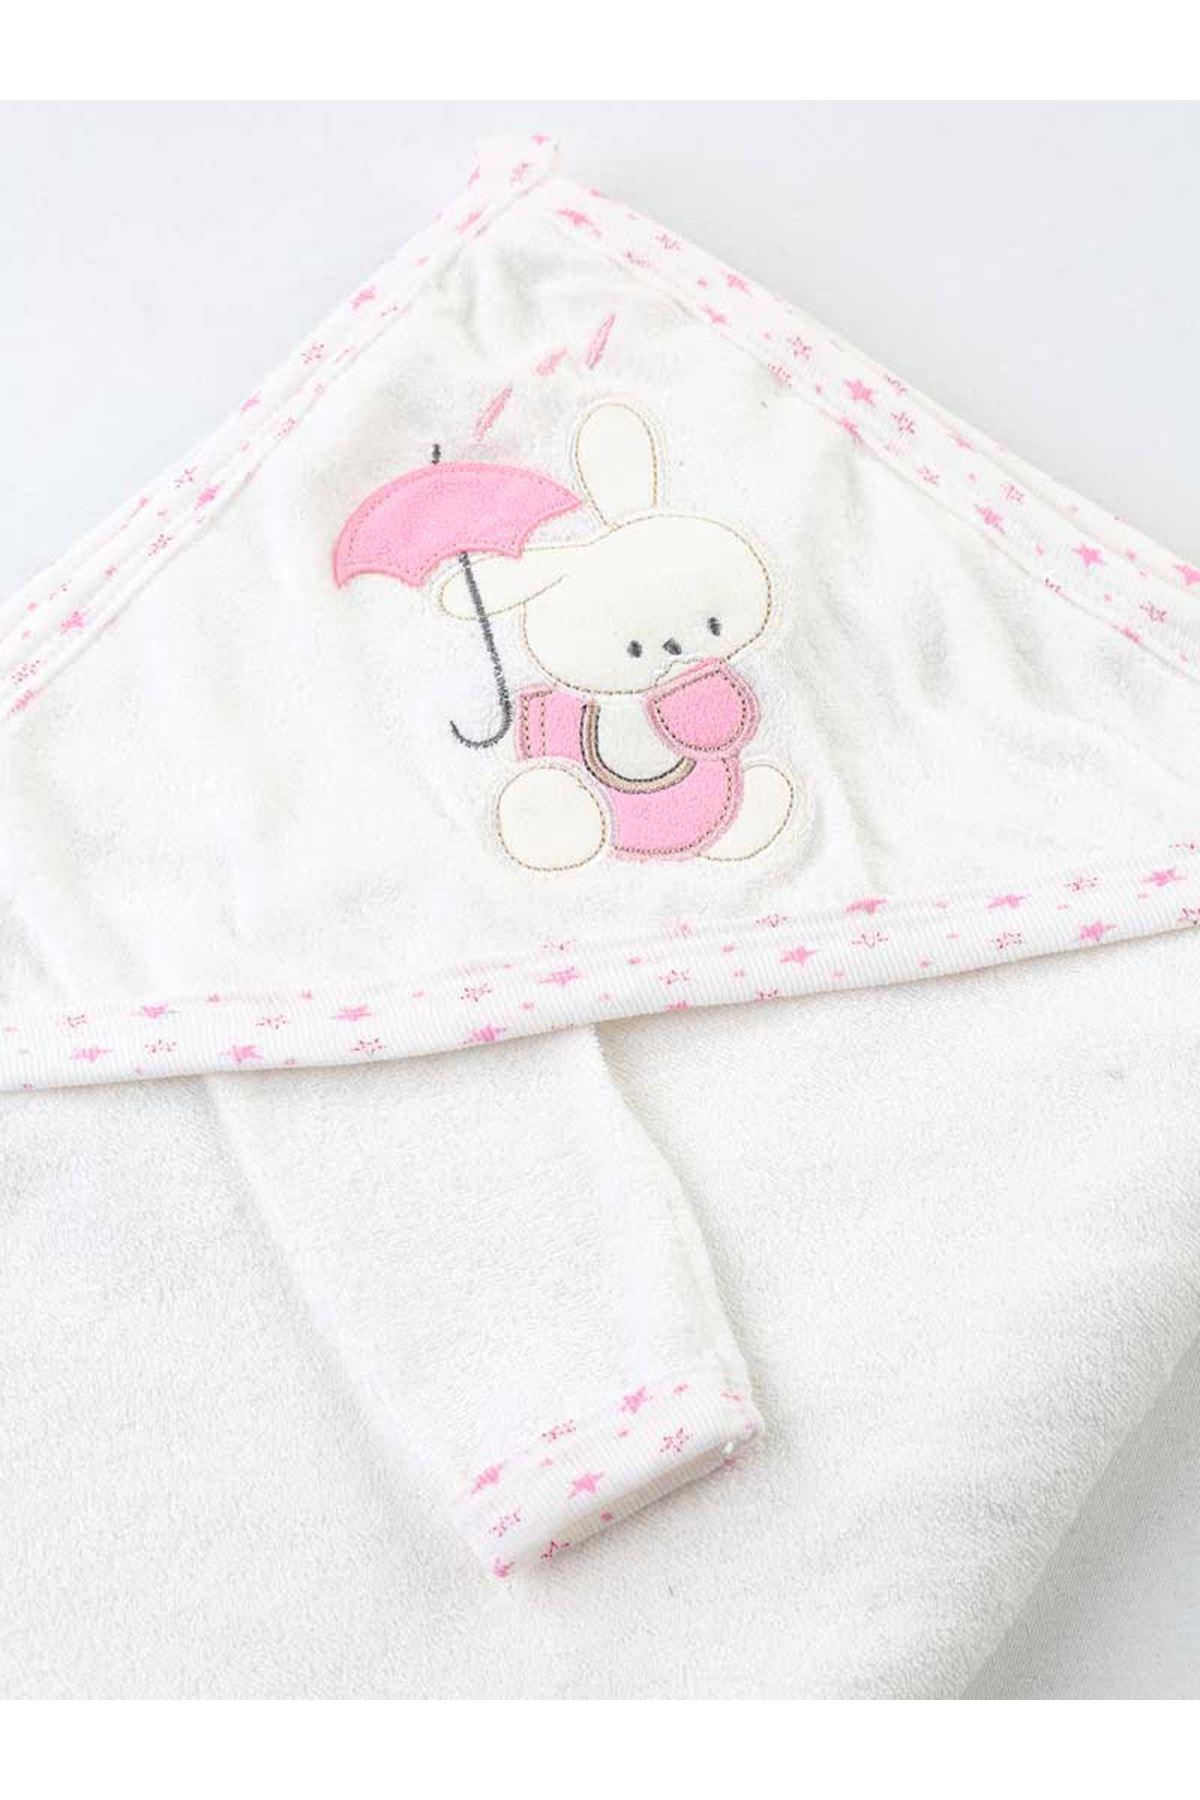 Pembe Beyaz Kız Bebek Pamuklu Kundak Banyo Havlusu